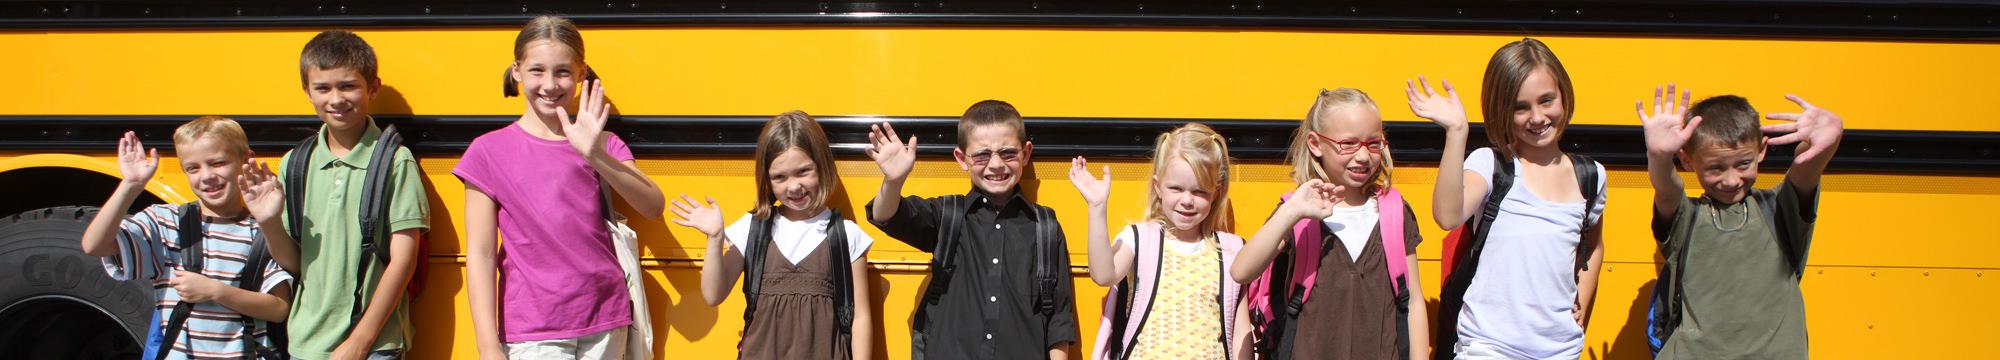 students standing in front of school bus